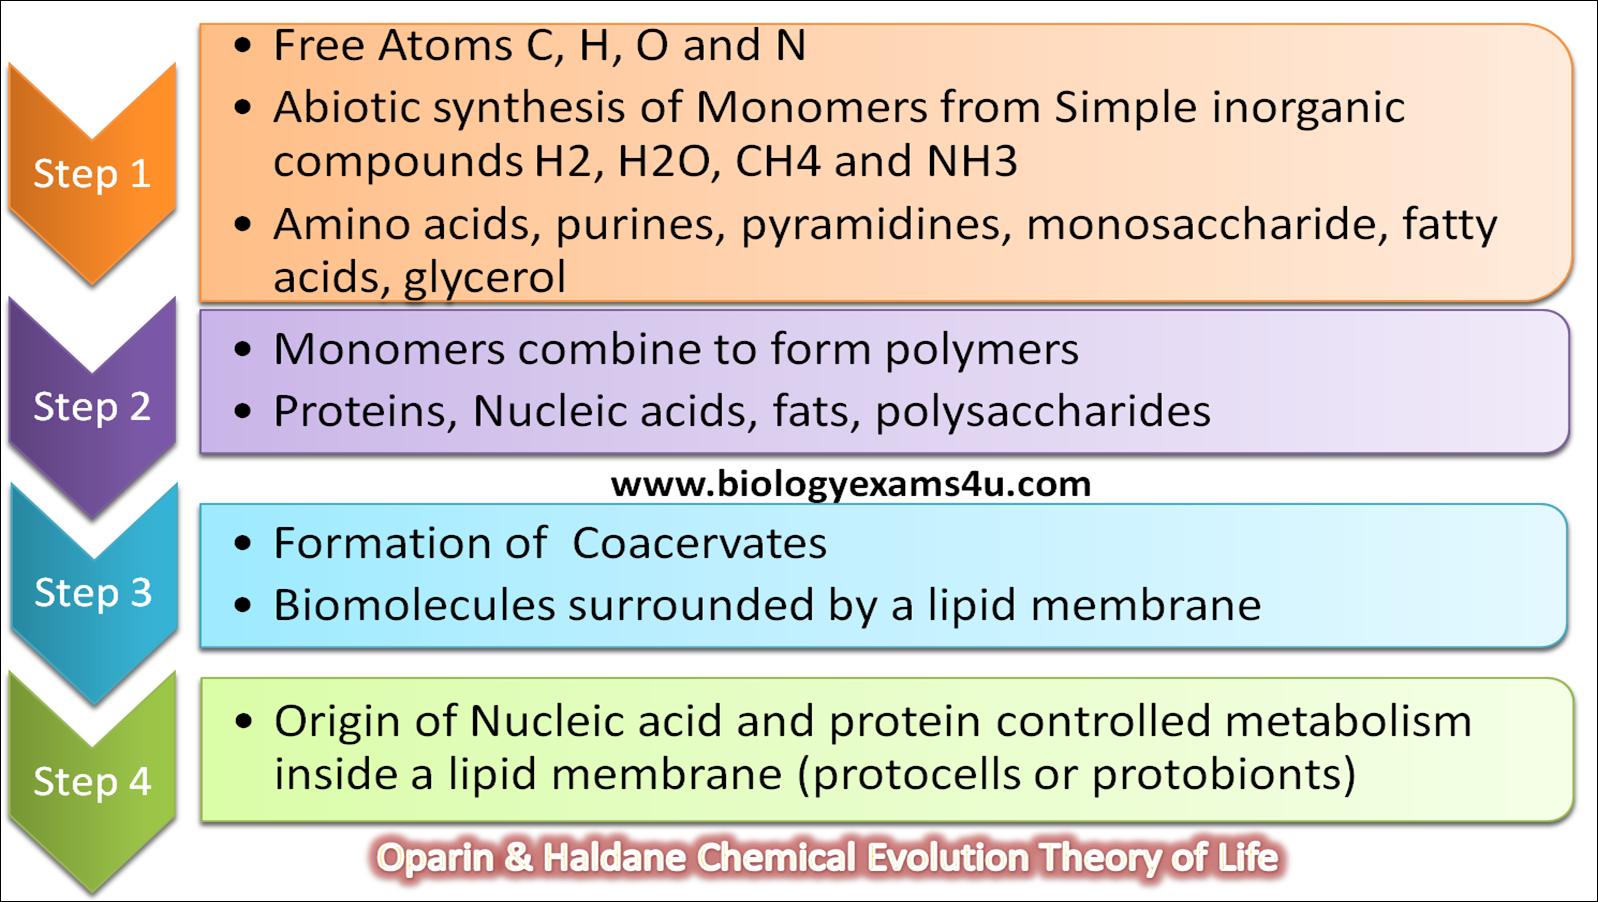 Oparin Haldene Theory of Chemical evolution steps